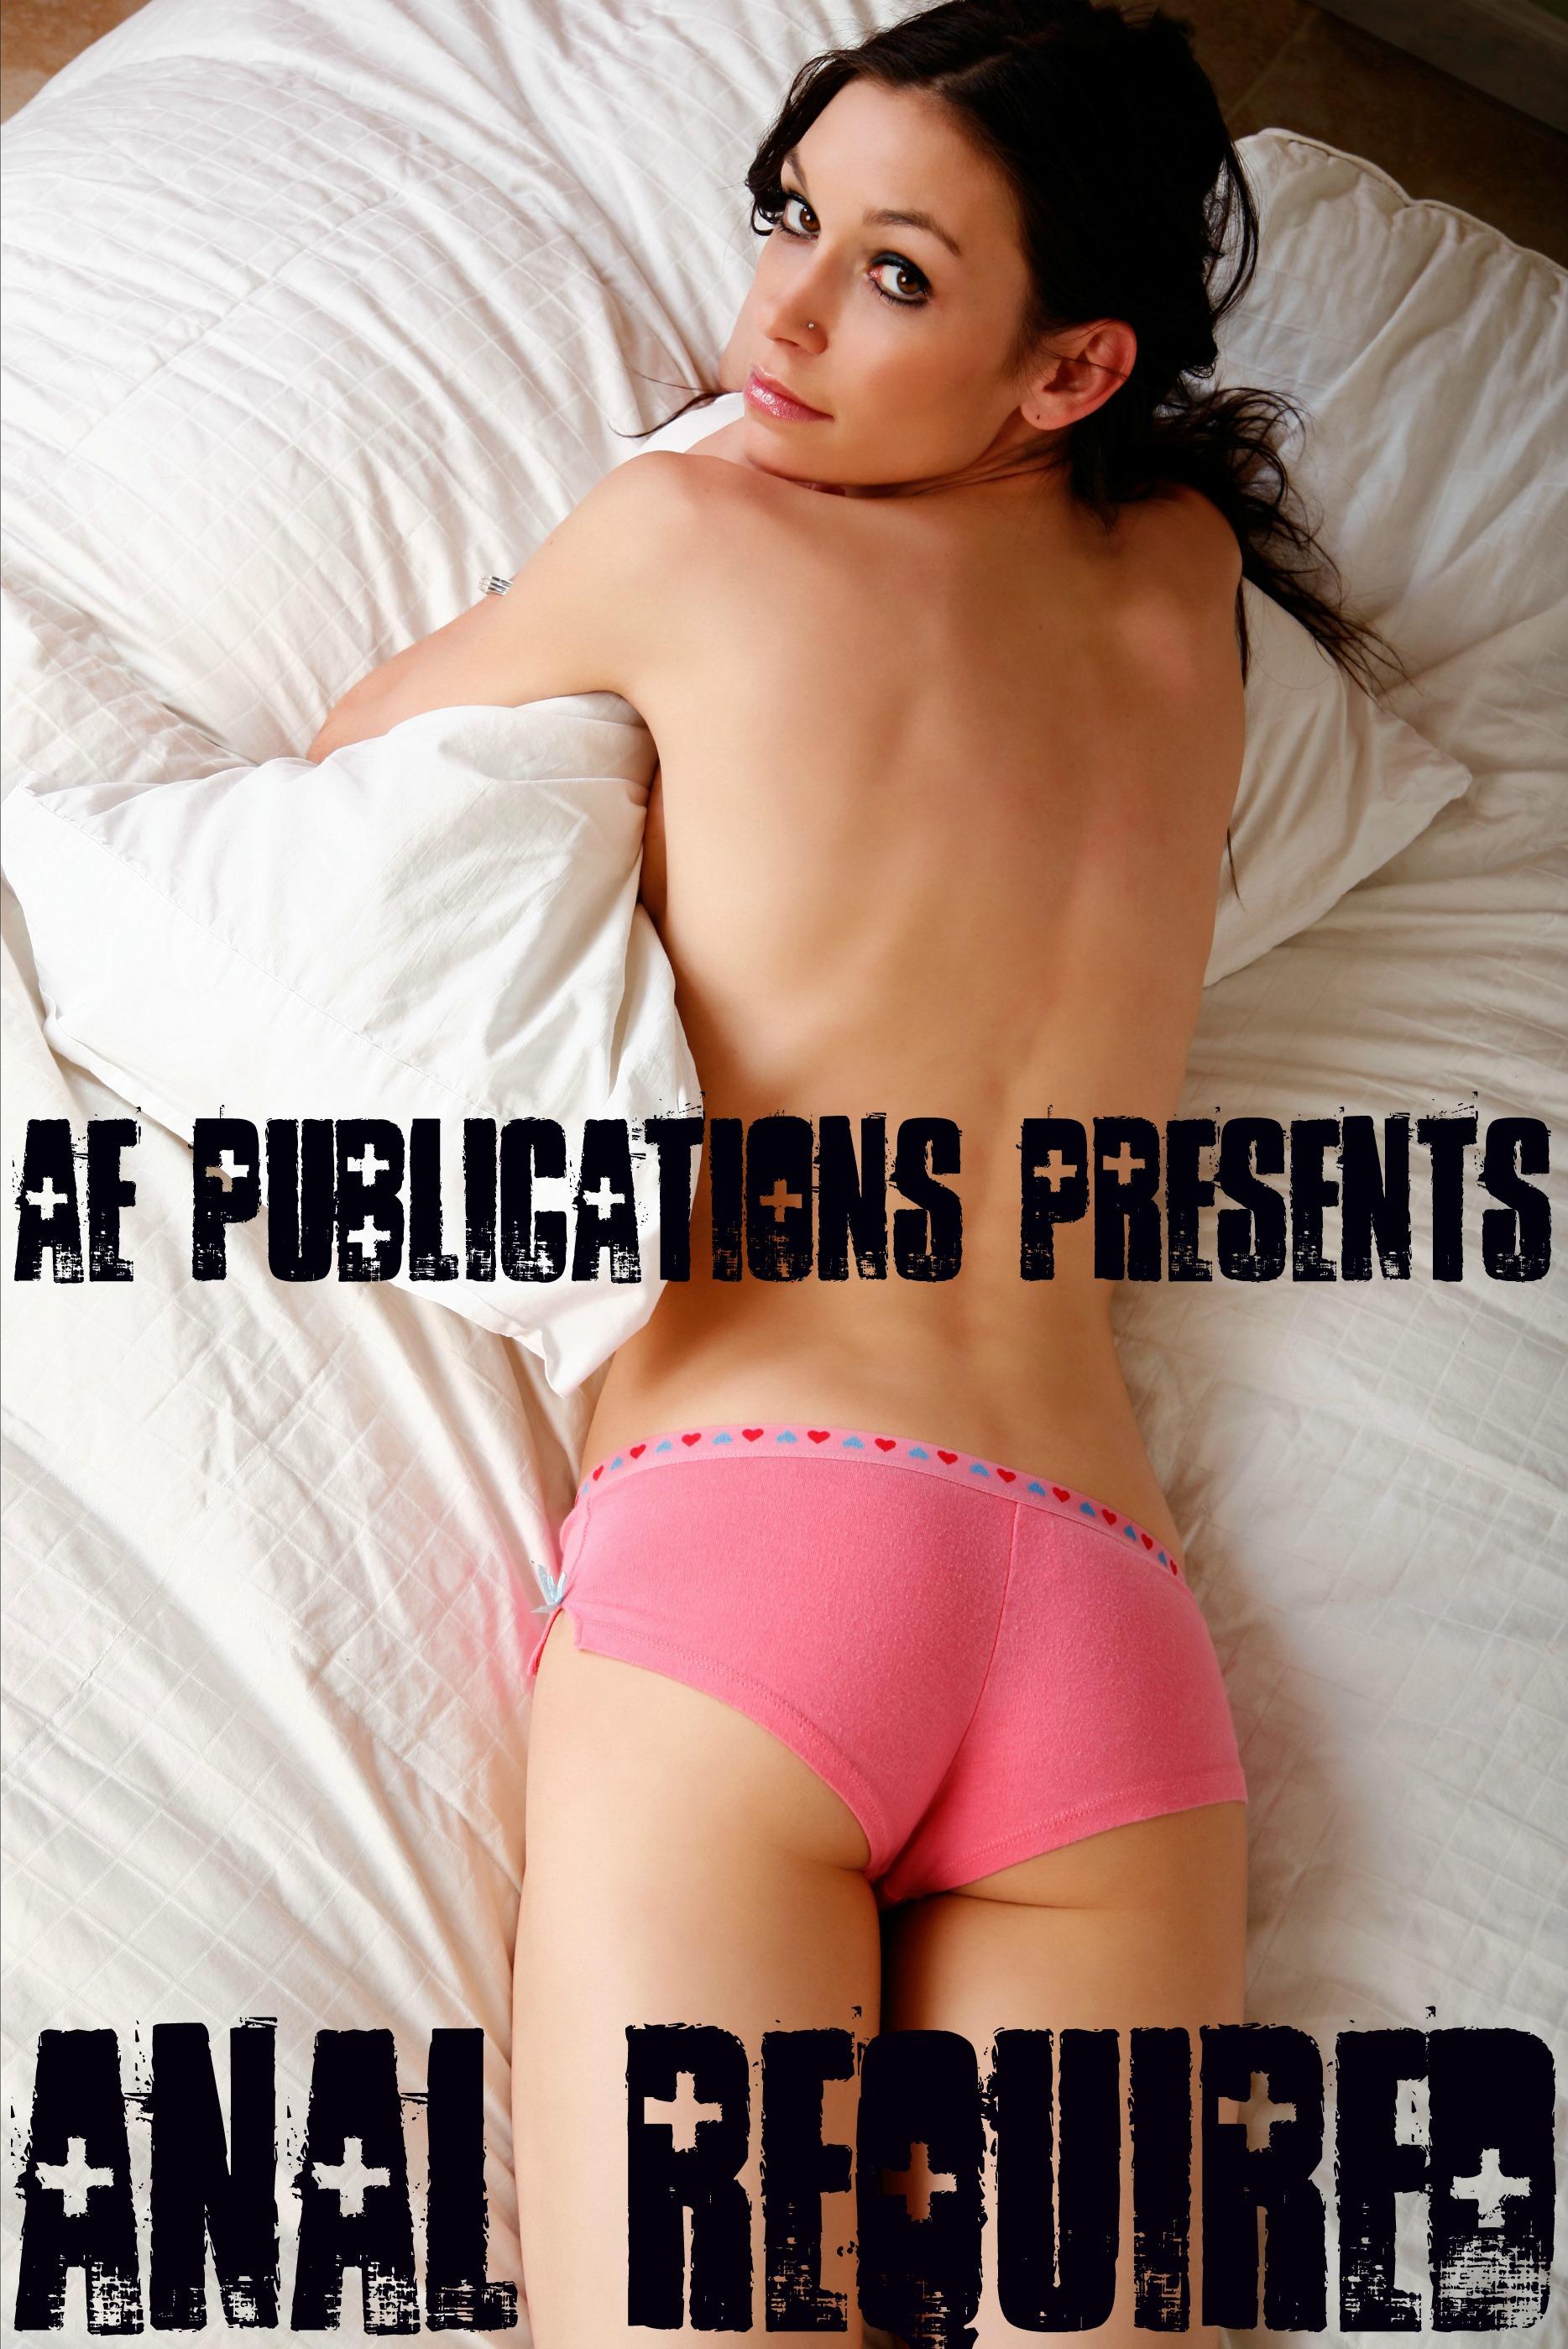 Pregnancy teen breaks abortion stories